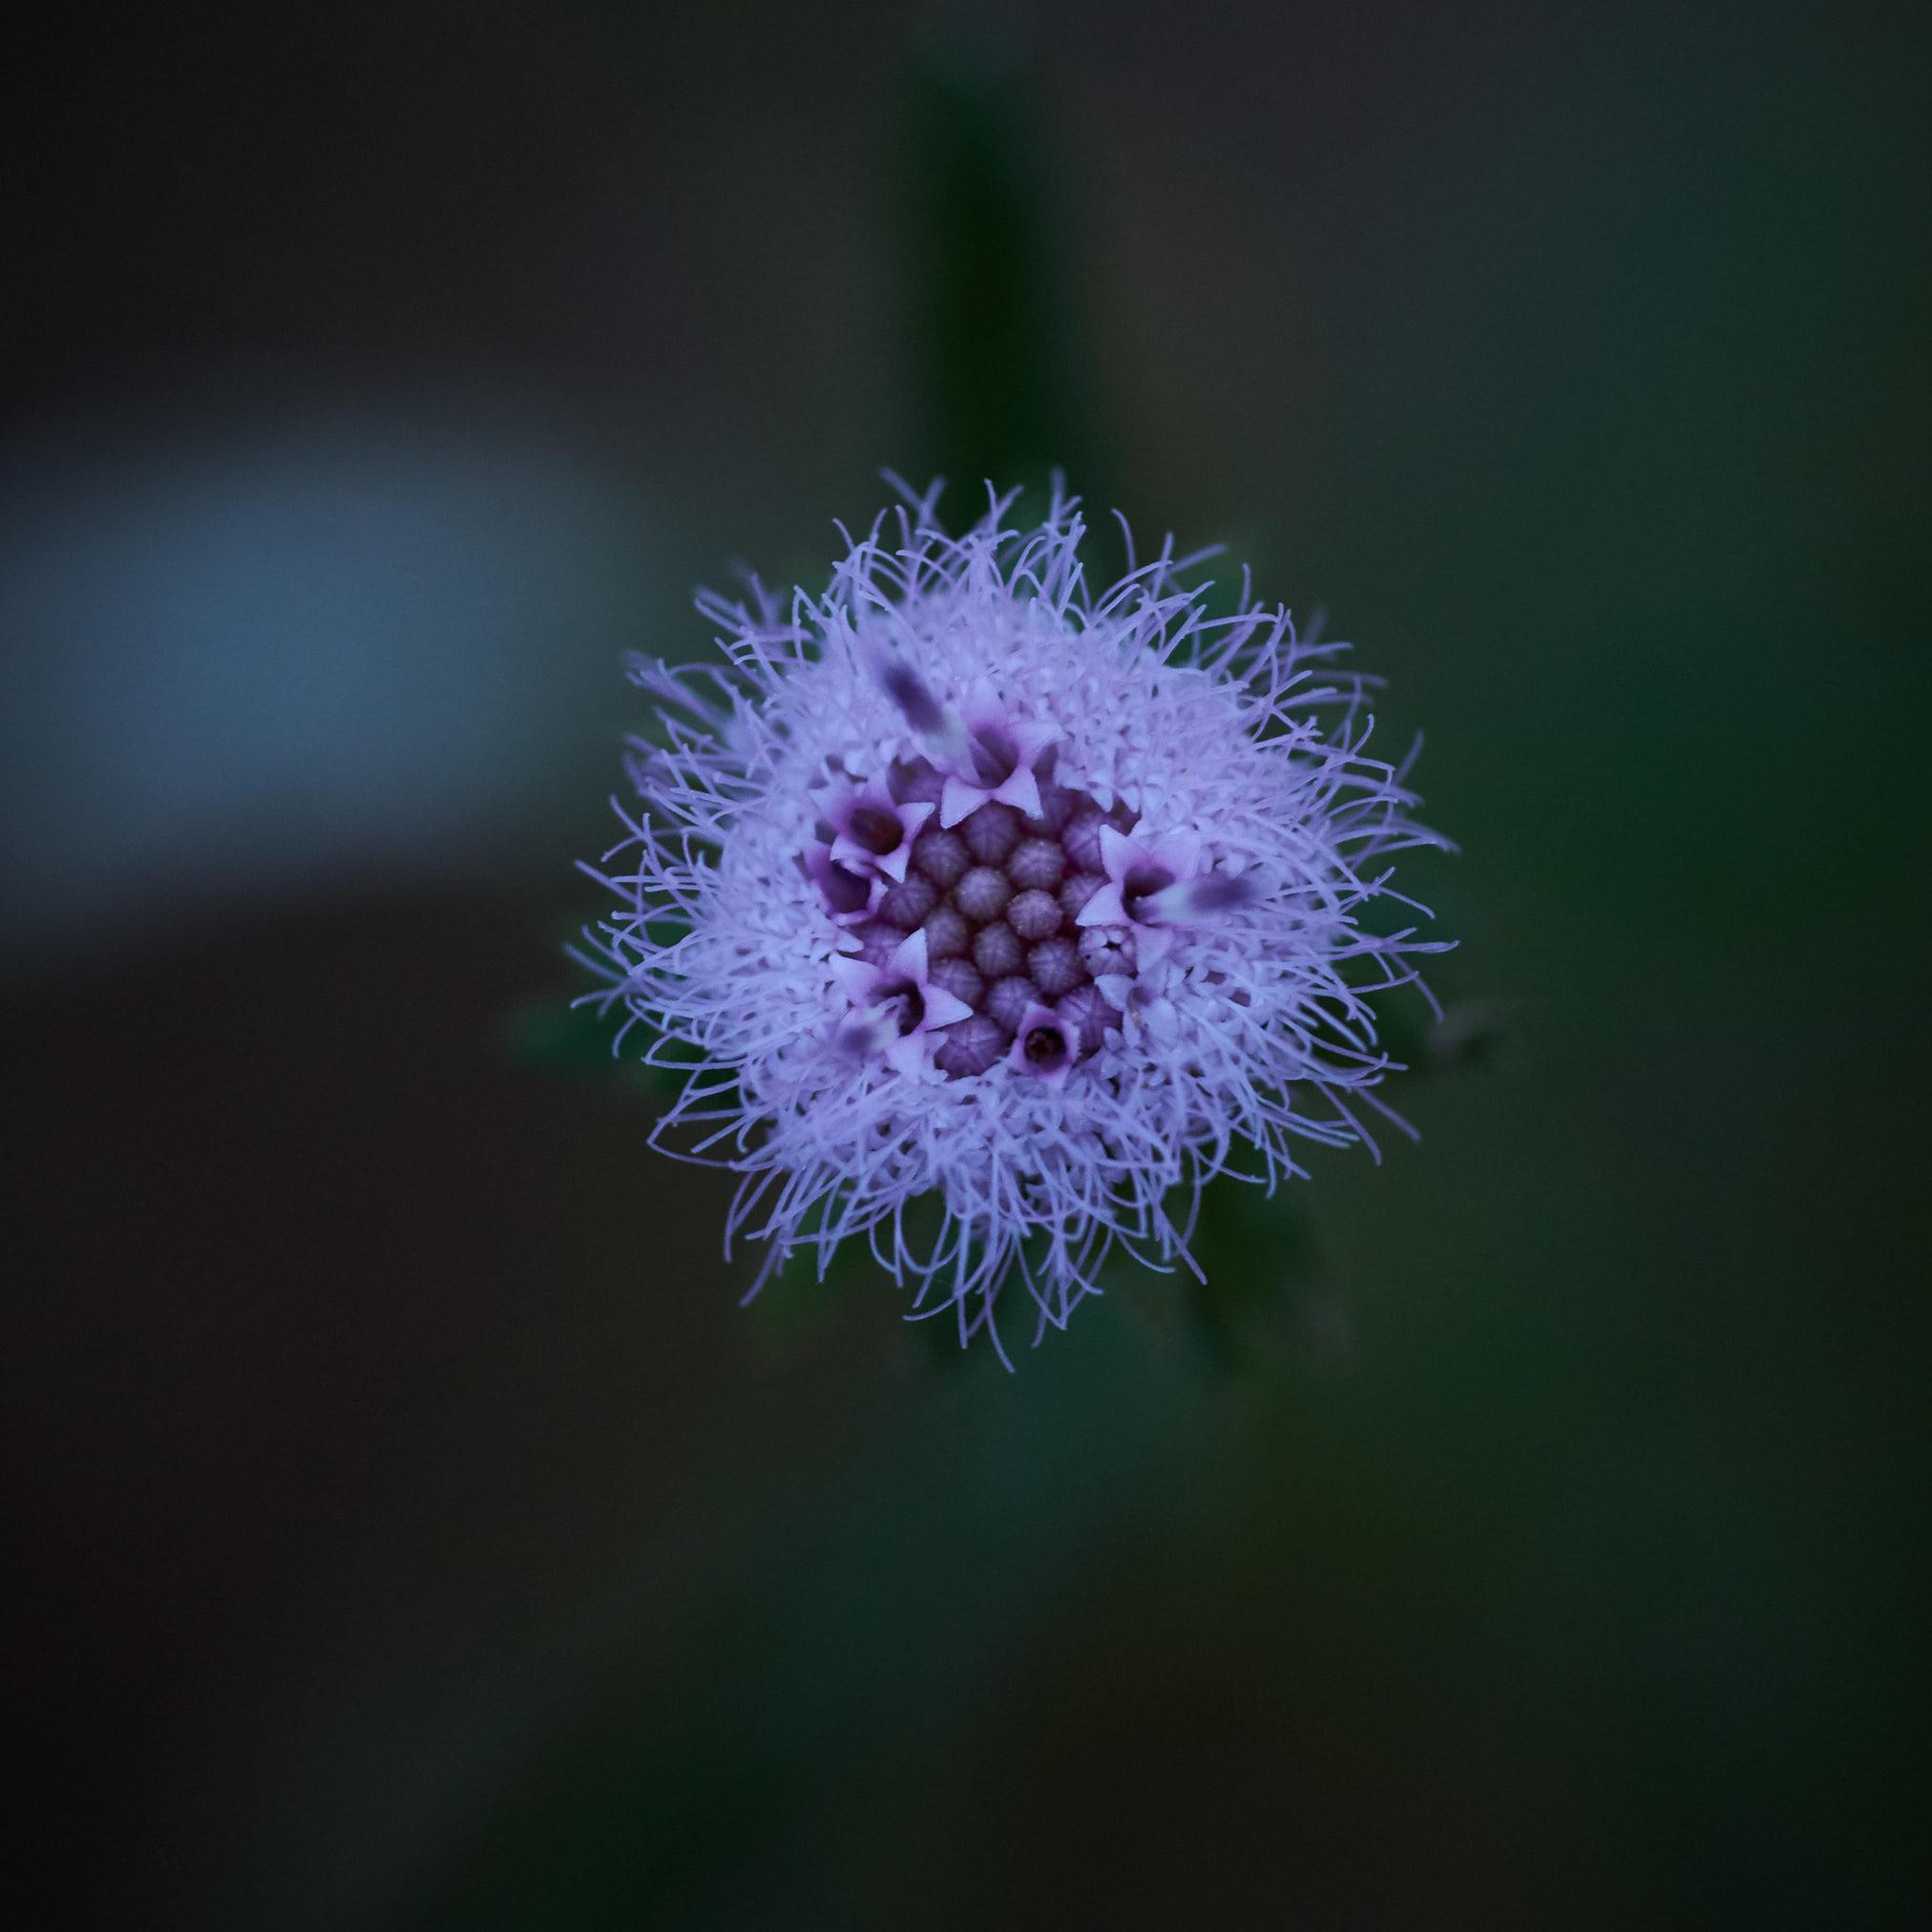 Tiny Flower - 8159